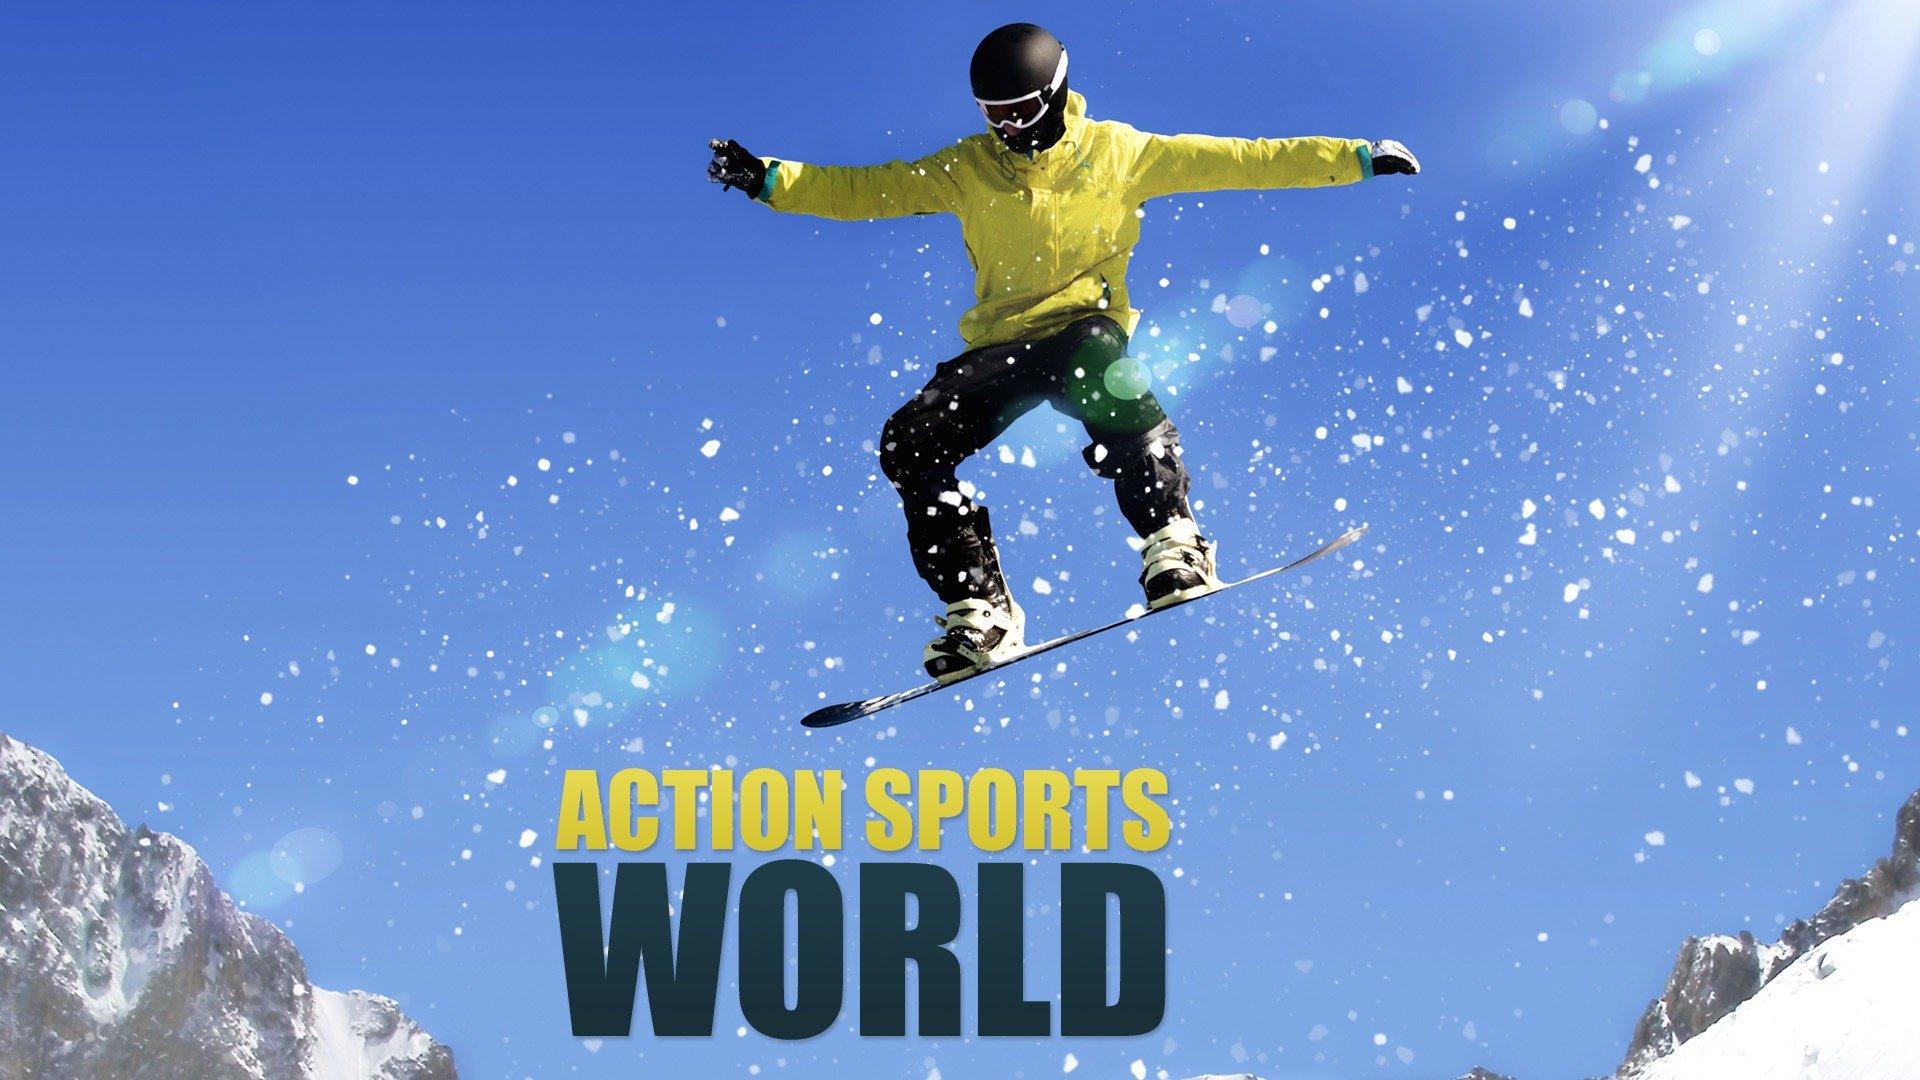 Action Sports World